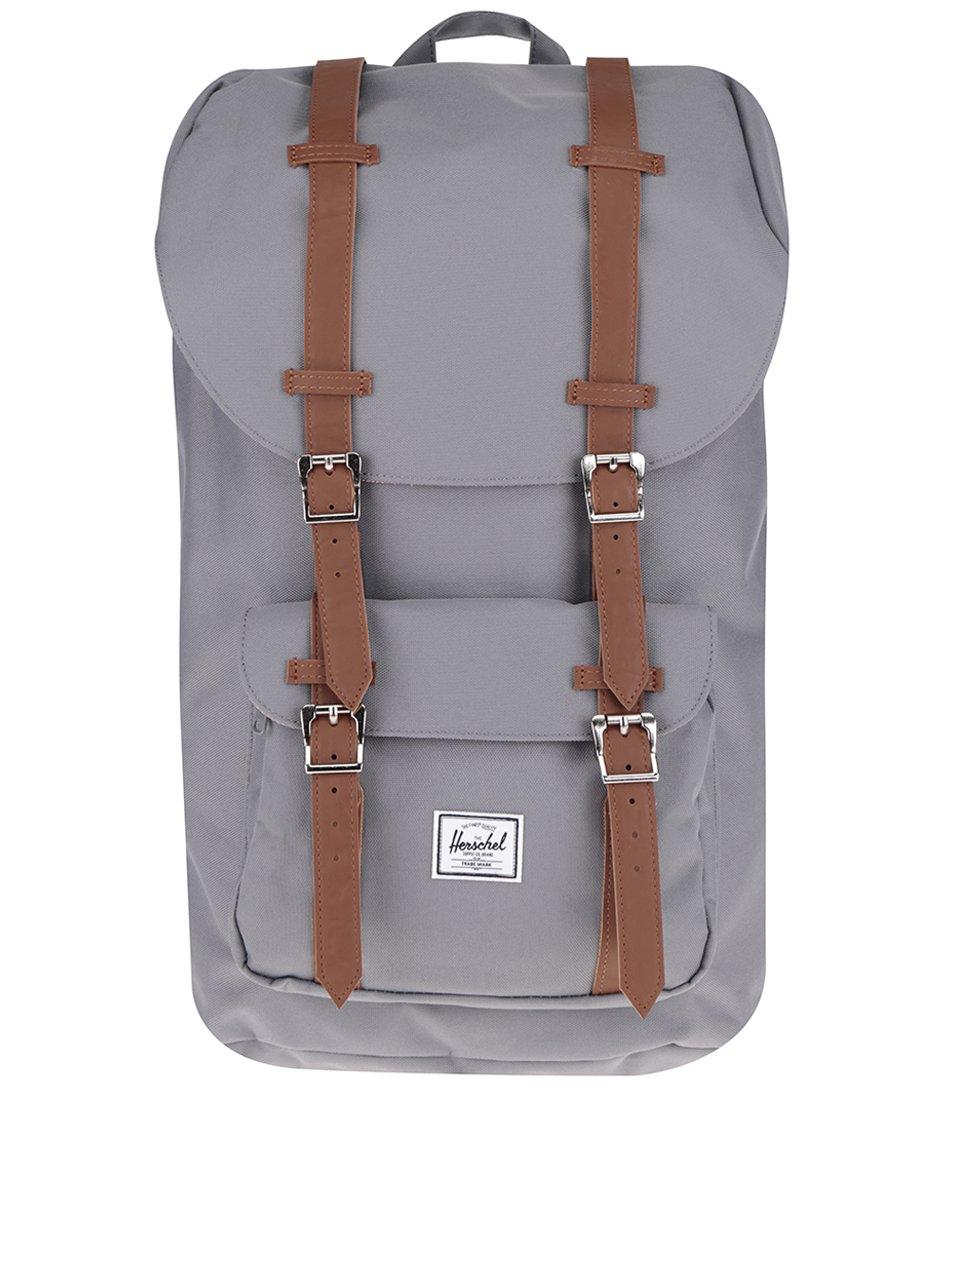 39c2e67b6a Sivý batoh s hnedými popruhmi Herschel Little America 25 l